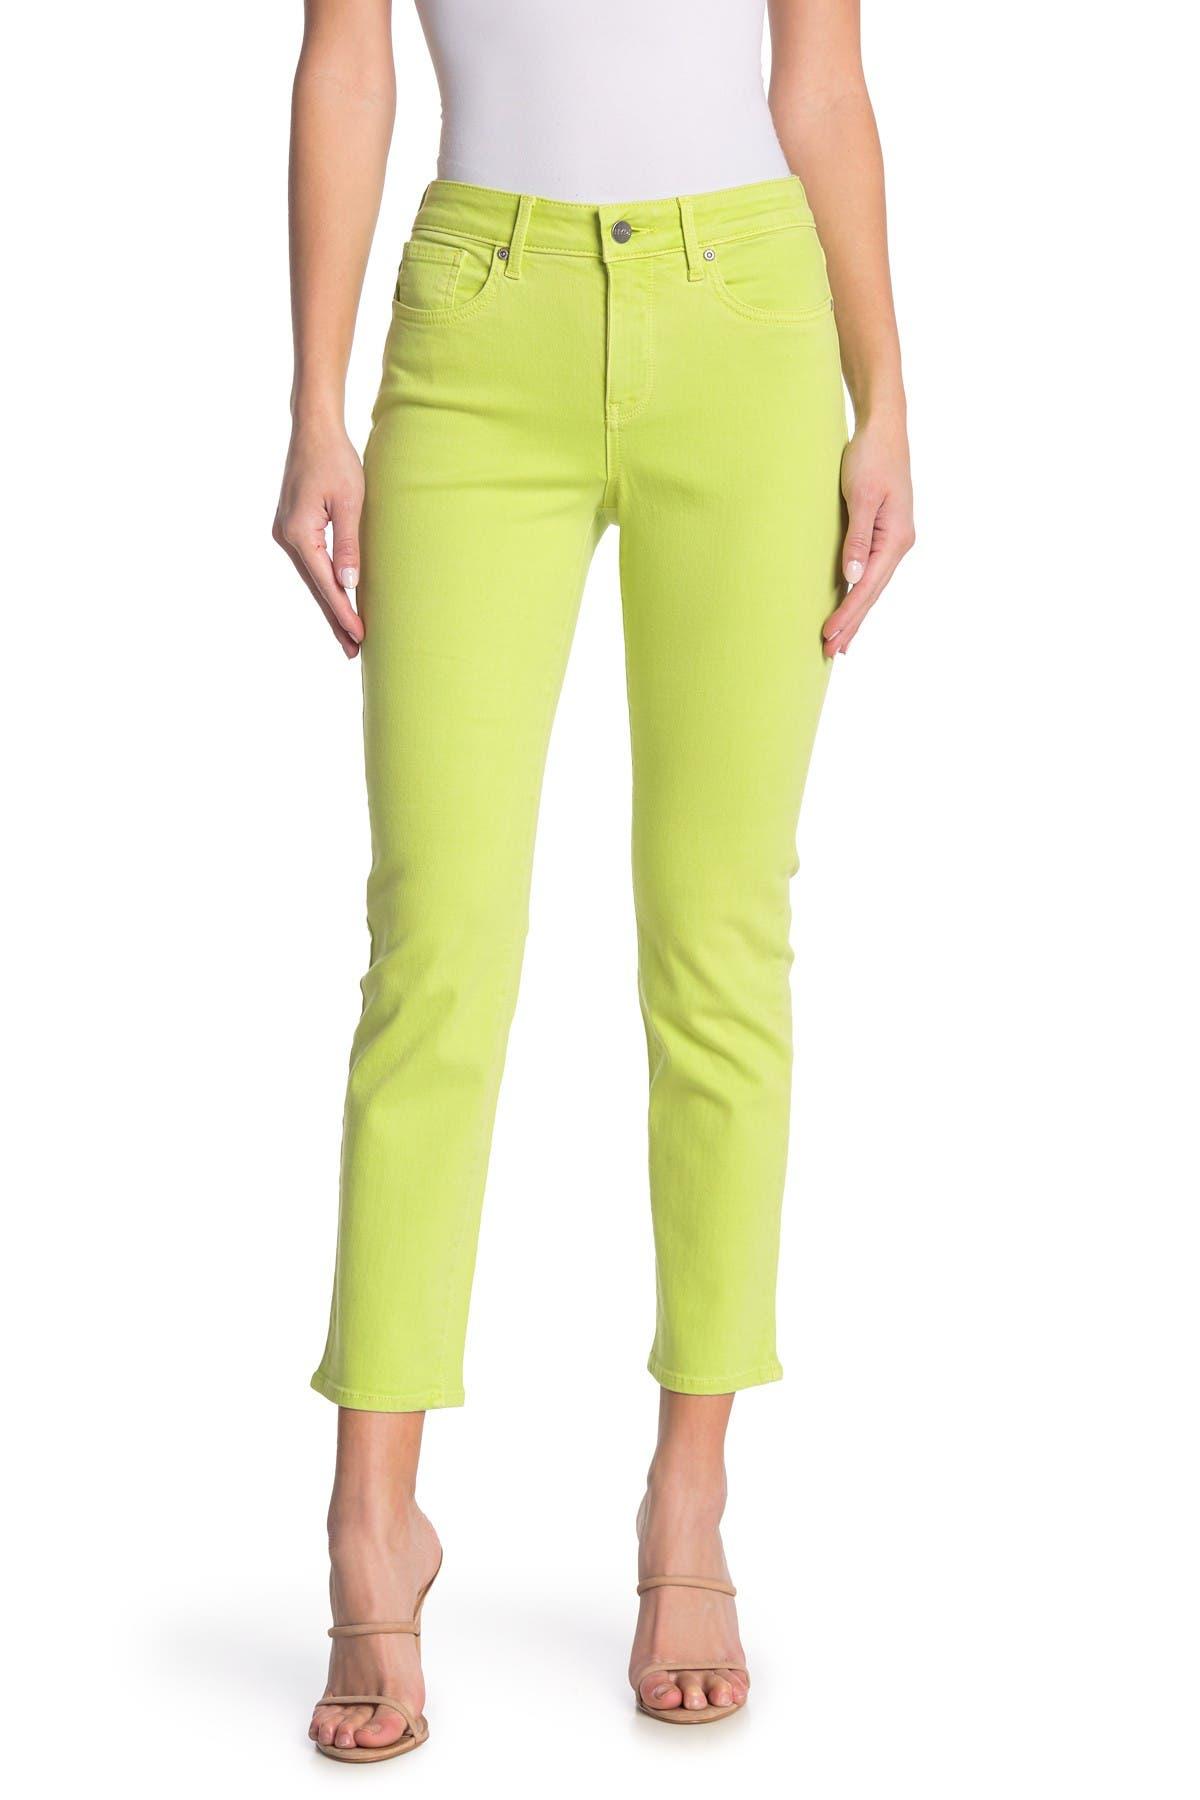 Image of NYDJ Sheri Slim Ankle Jeans